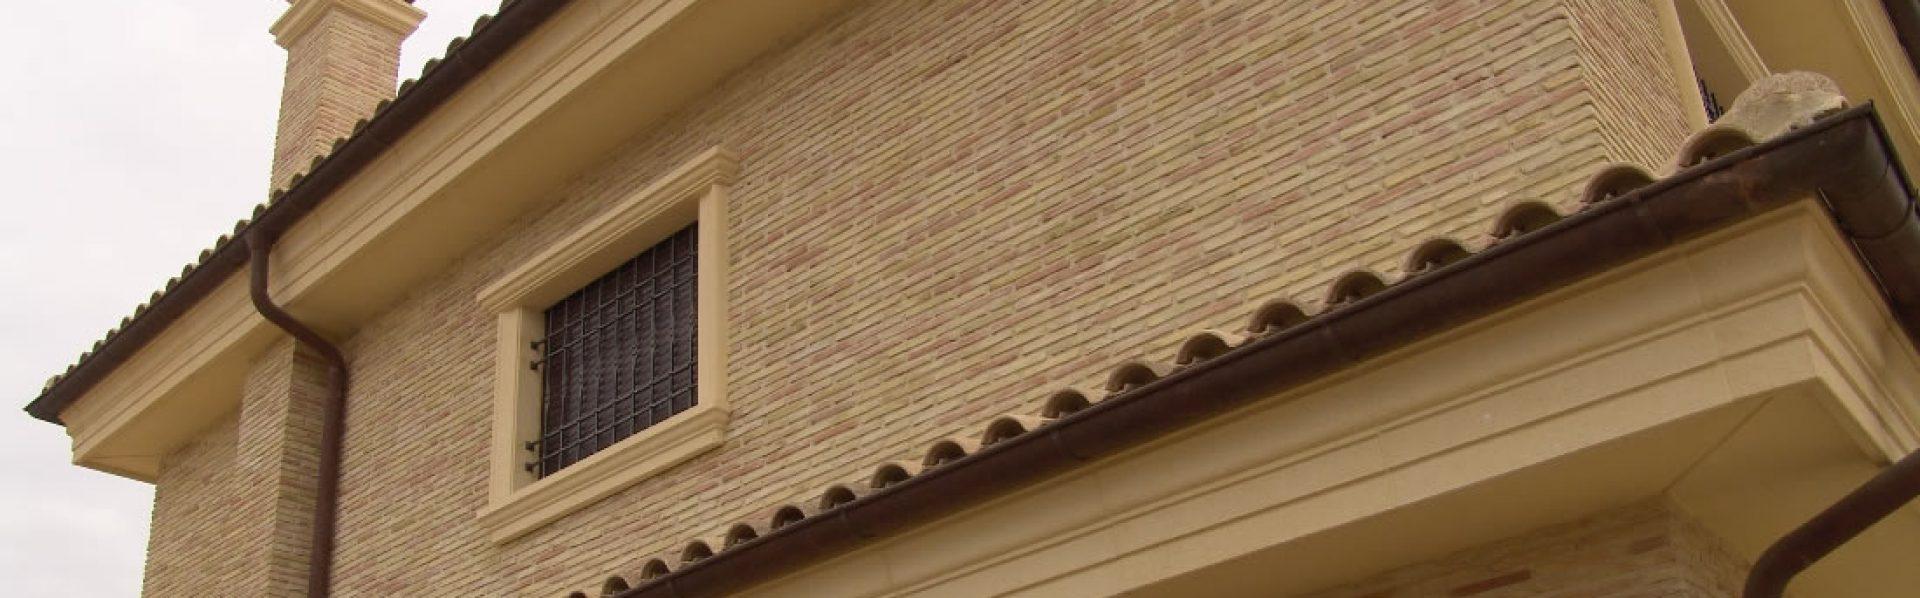 Ceramica Blas Aleman | Ladrillo artesano | Baldosas Terracota | Suelos de barro